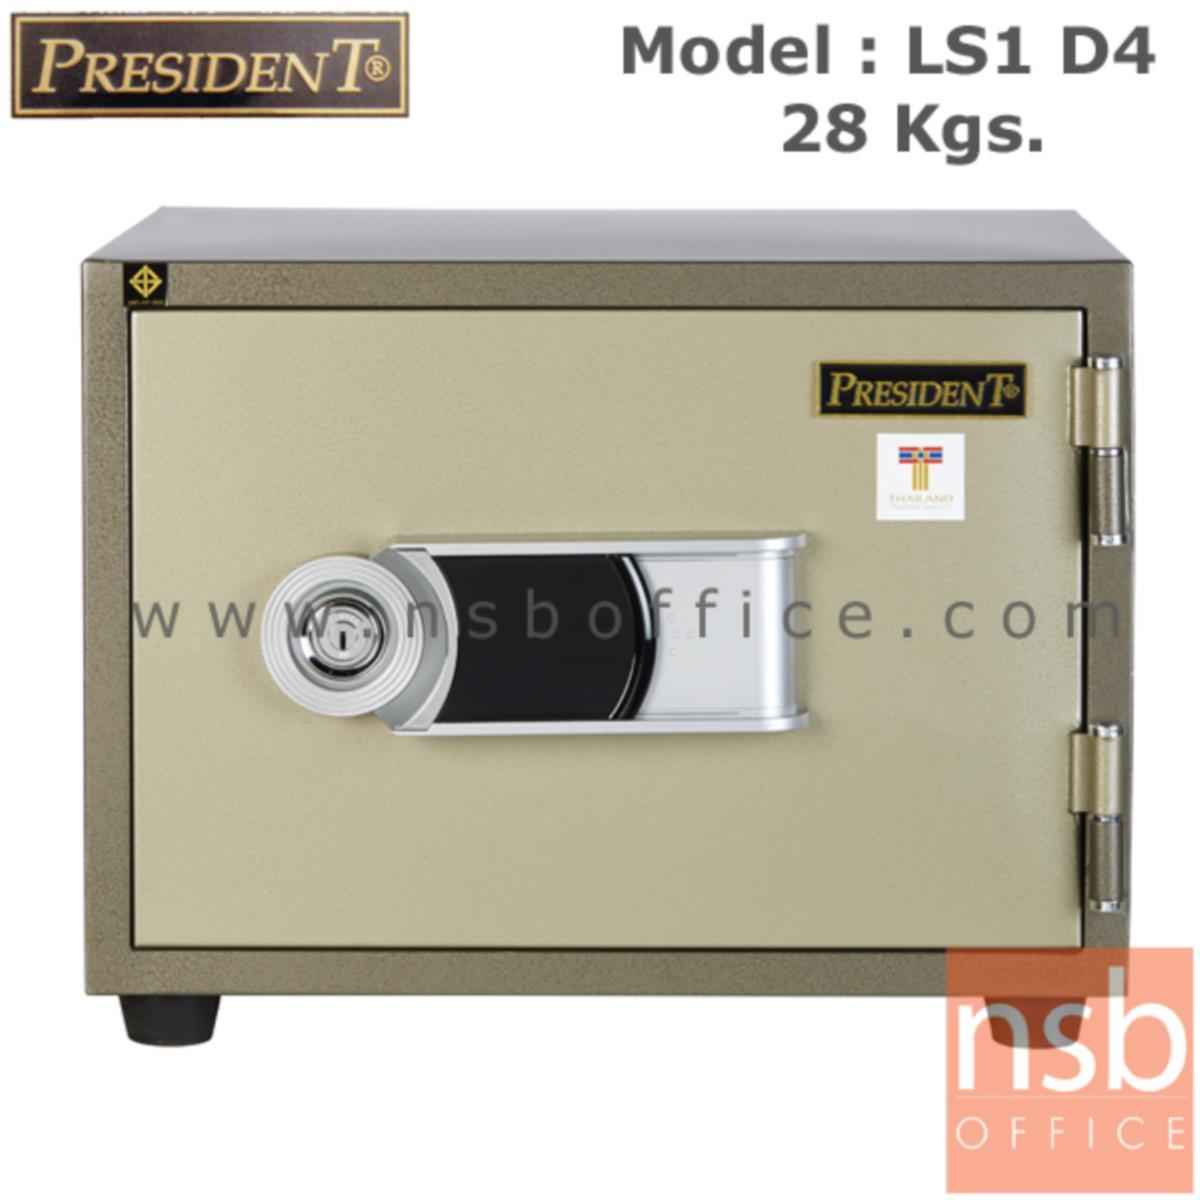 F05A068:ตู้เซฟนิรภัยชนิดดิจิตอลแบบใหม่ 28 กก. รุ่น PRESIDENT-LS1D4 มี 1 กุญแจ 1 รหัส (รหัสใช้กดหน้าตู้)